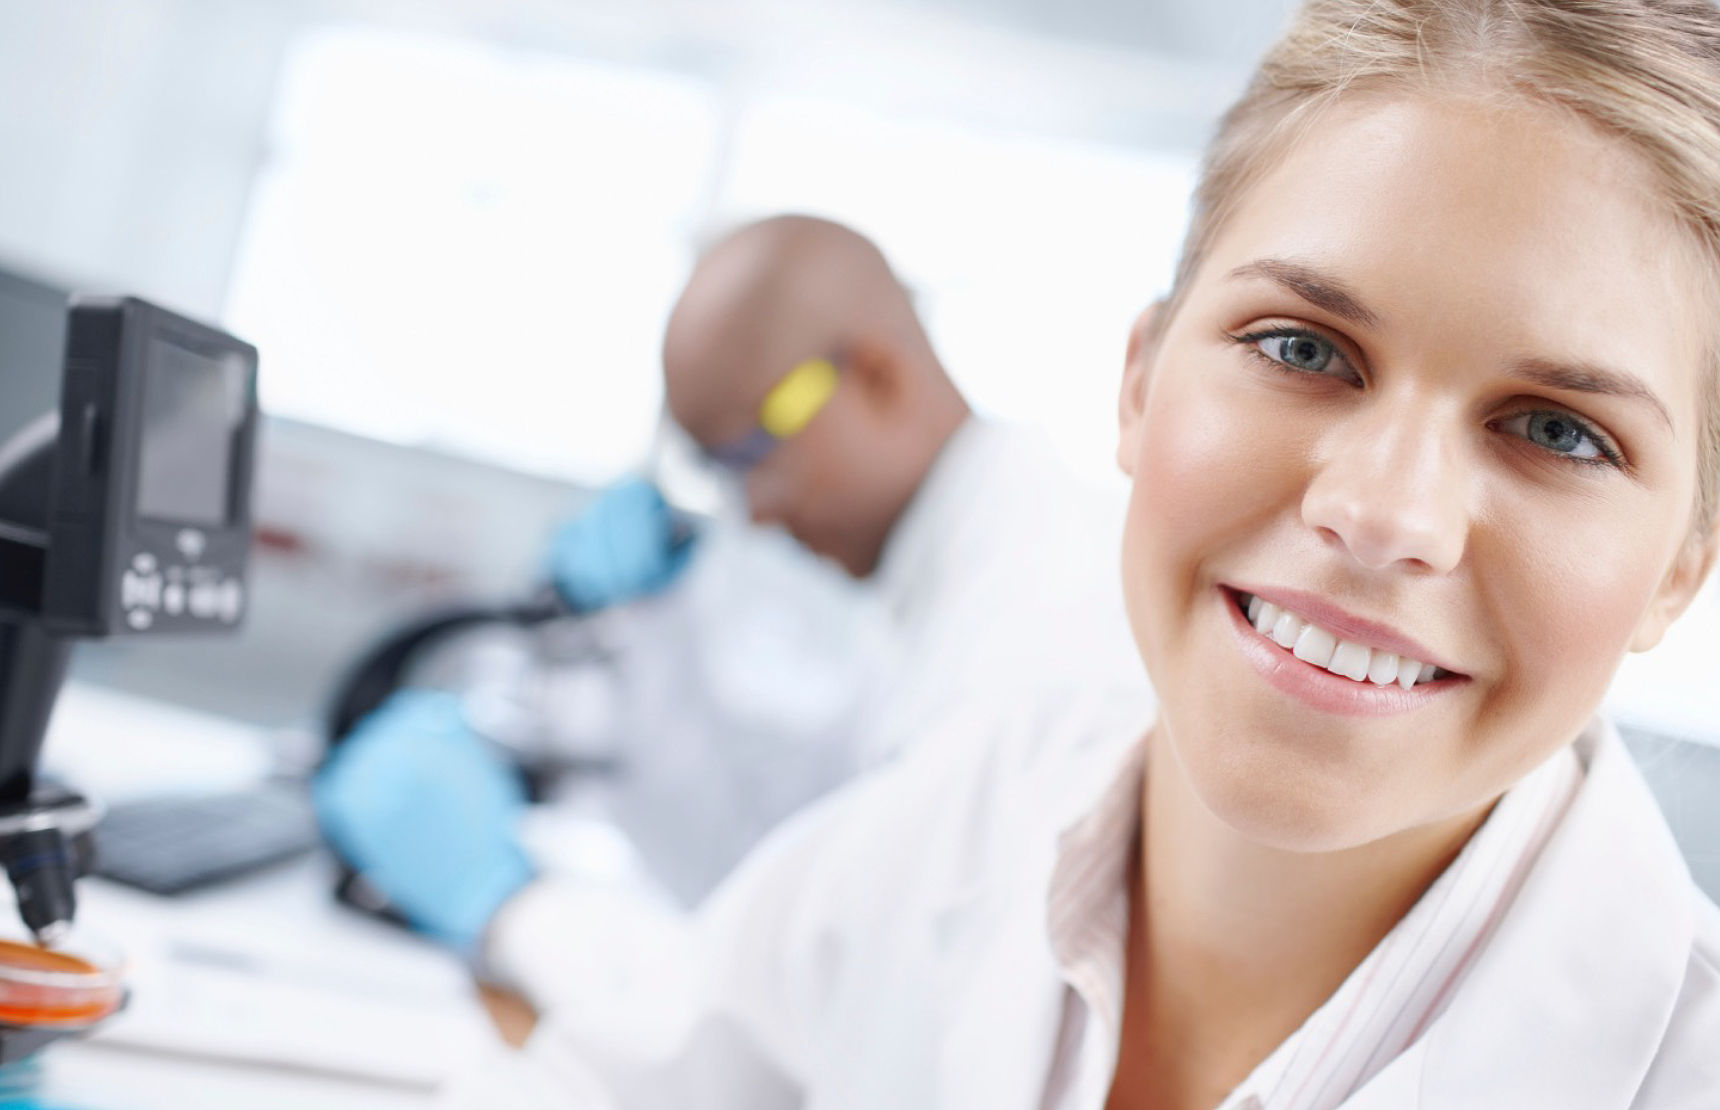 Secondary Use Of Pharma & Diagnostics Data